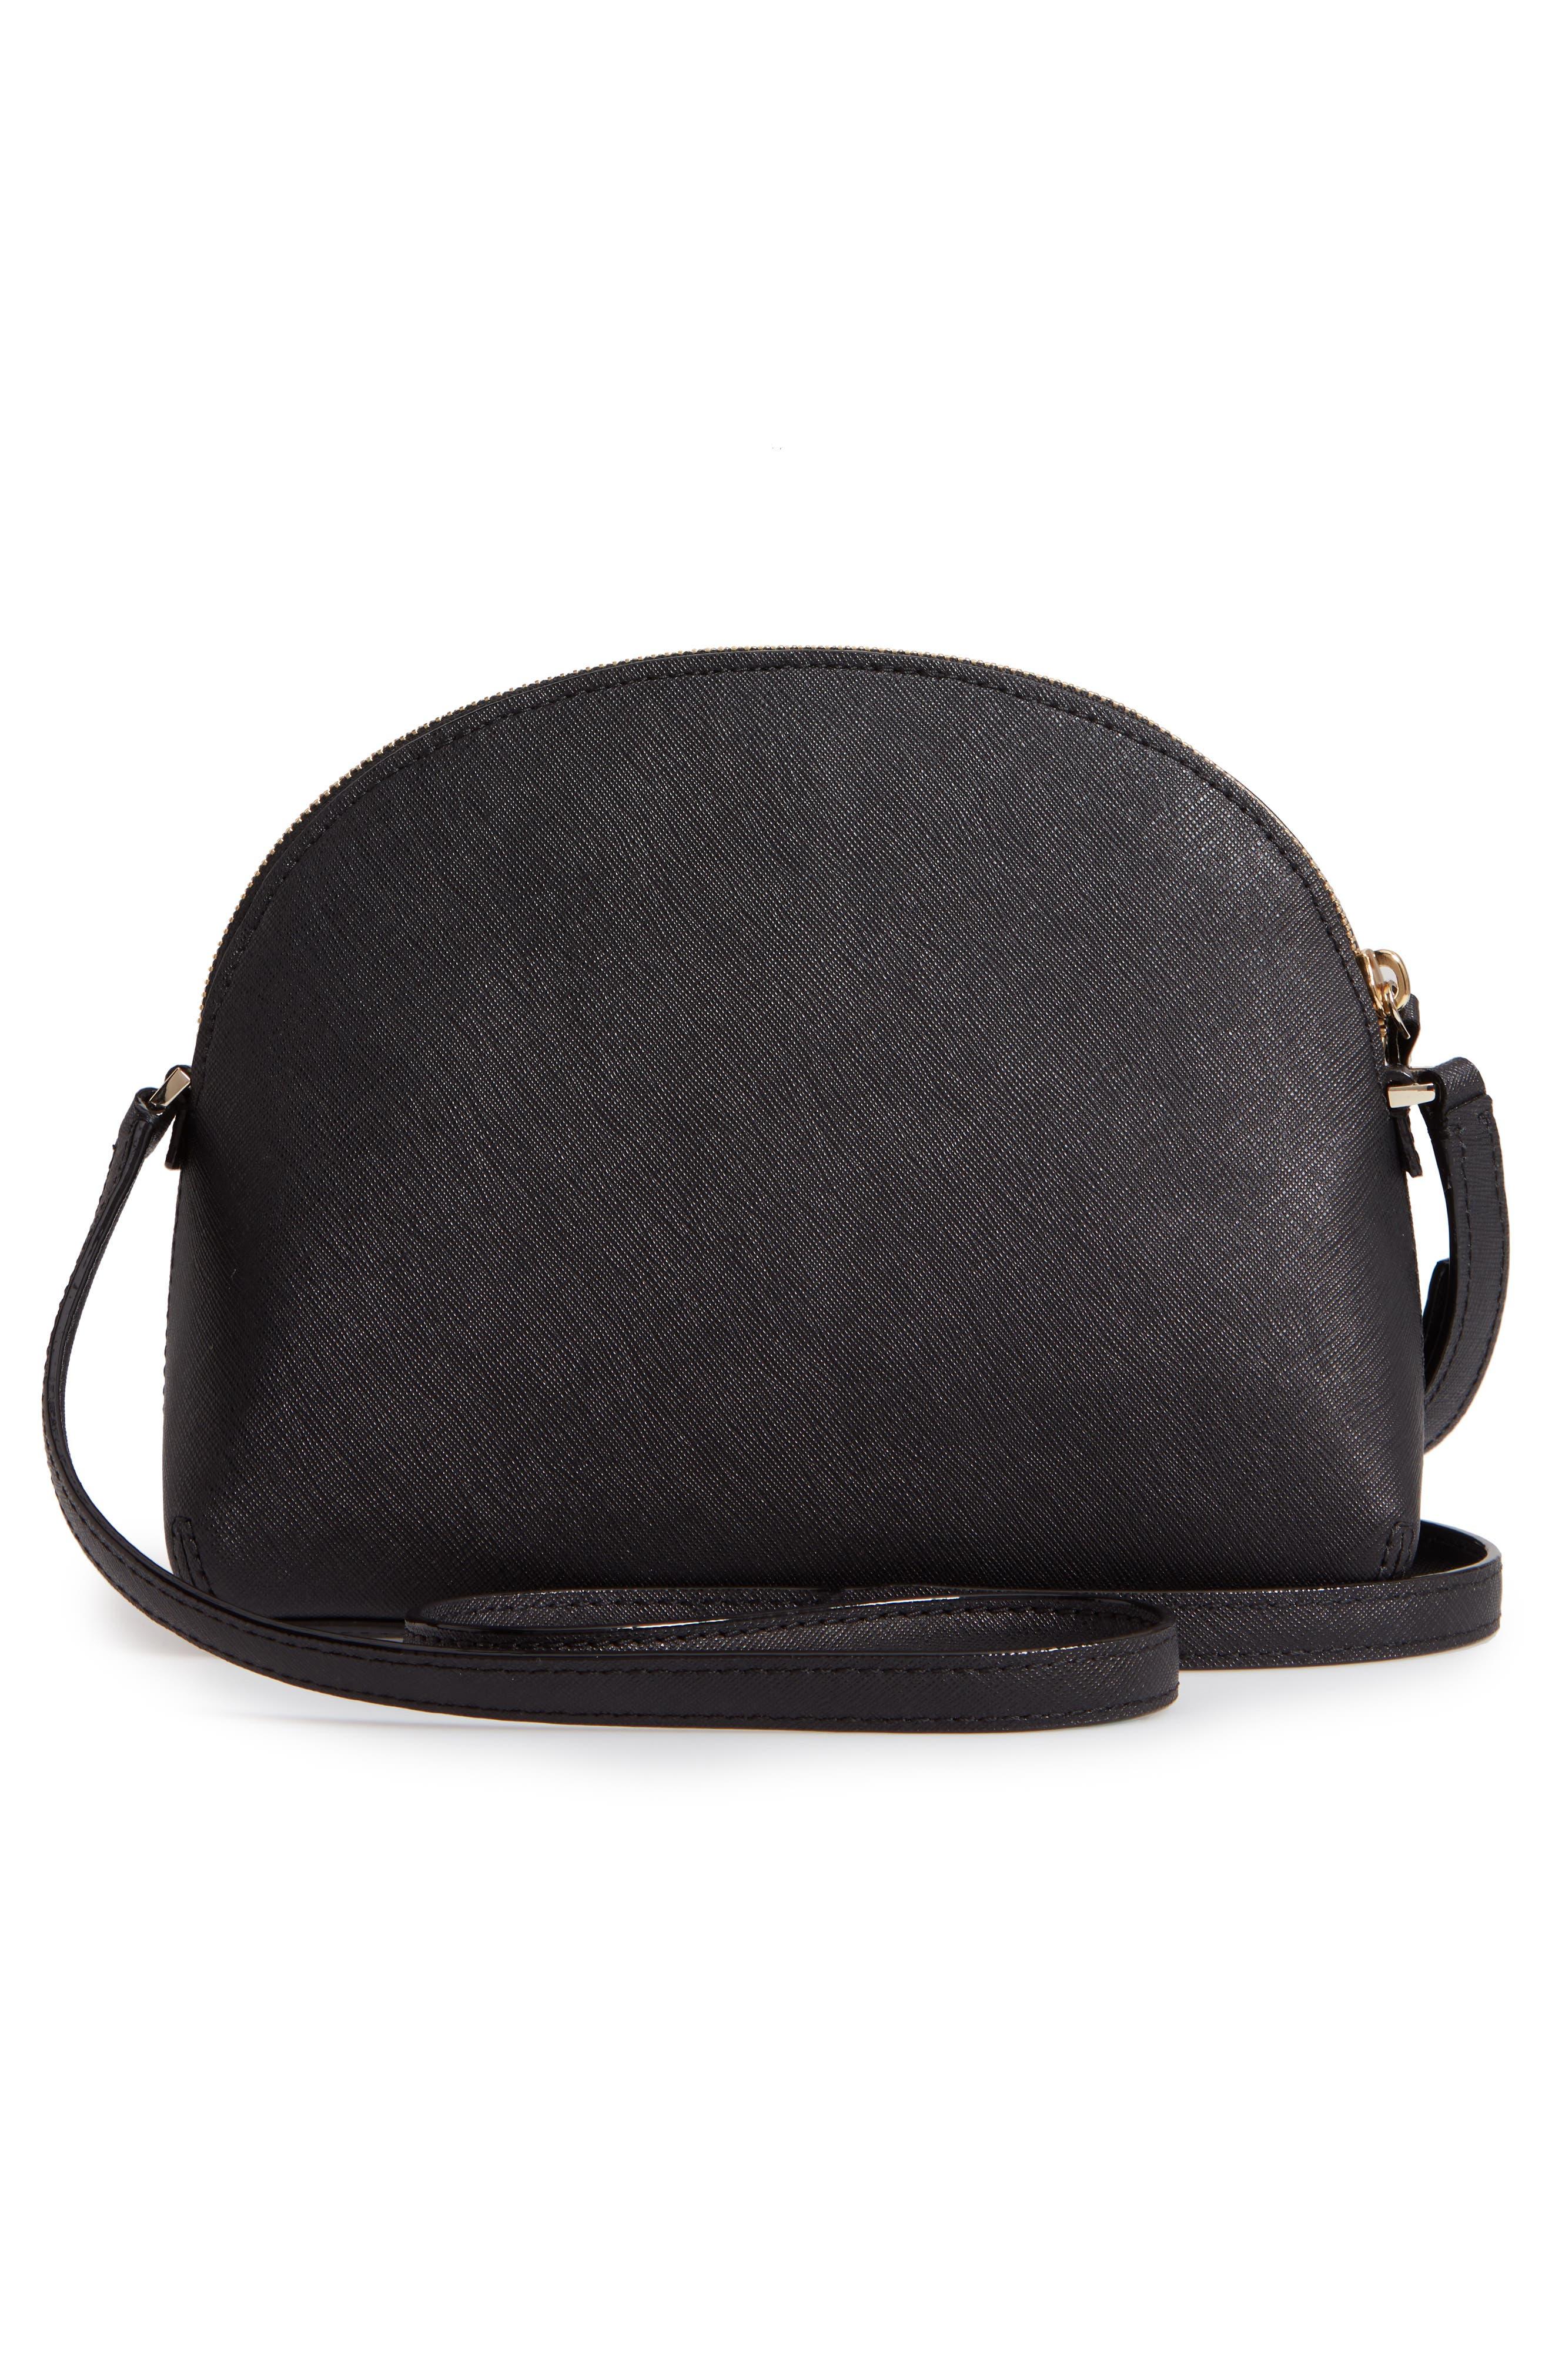 KATE SPADE NEW YORK, cameron street large hilli leather crossbody bag, Alternate thumbnail 3, color, 001